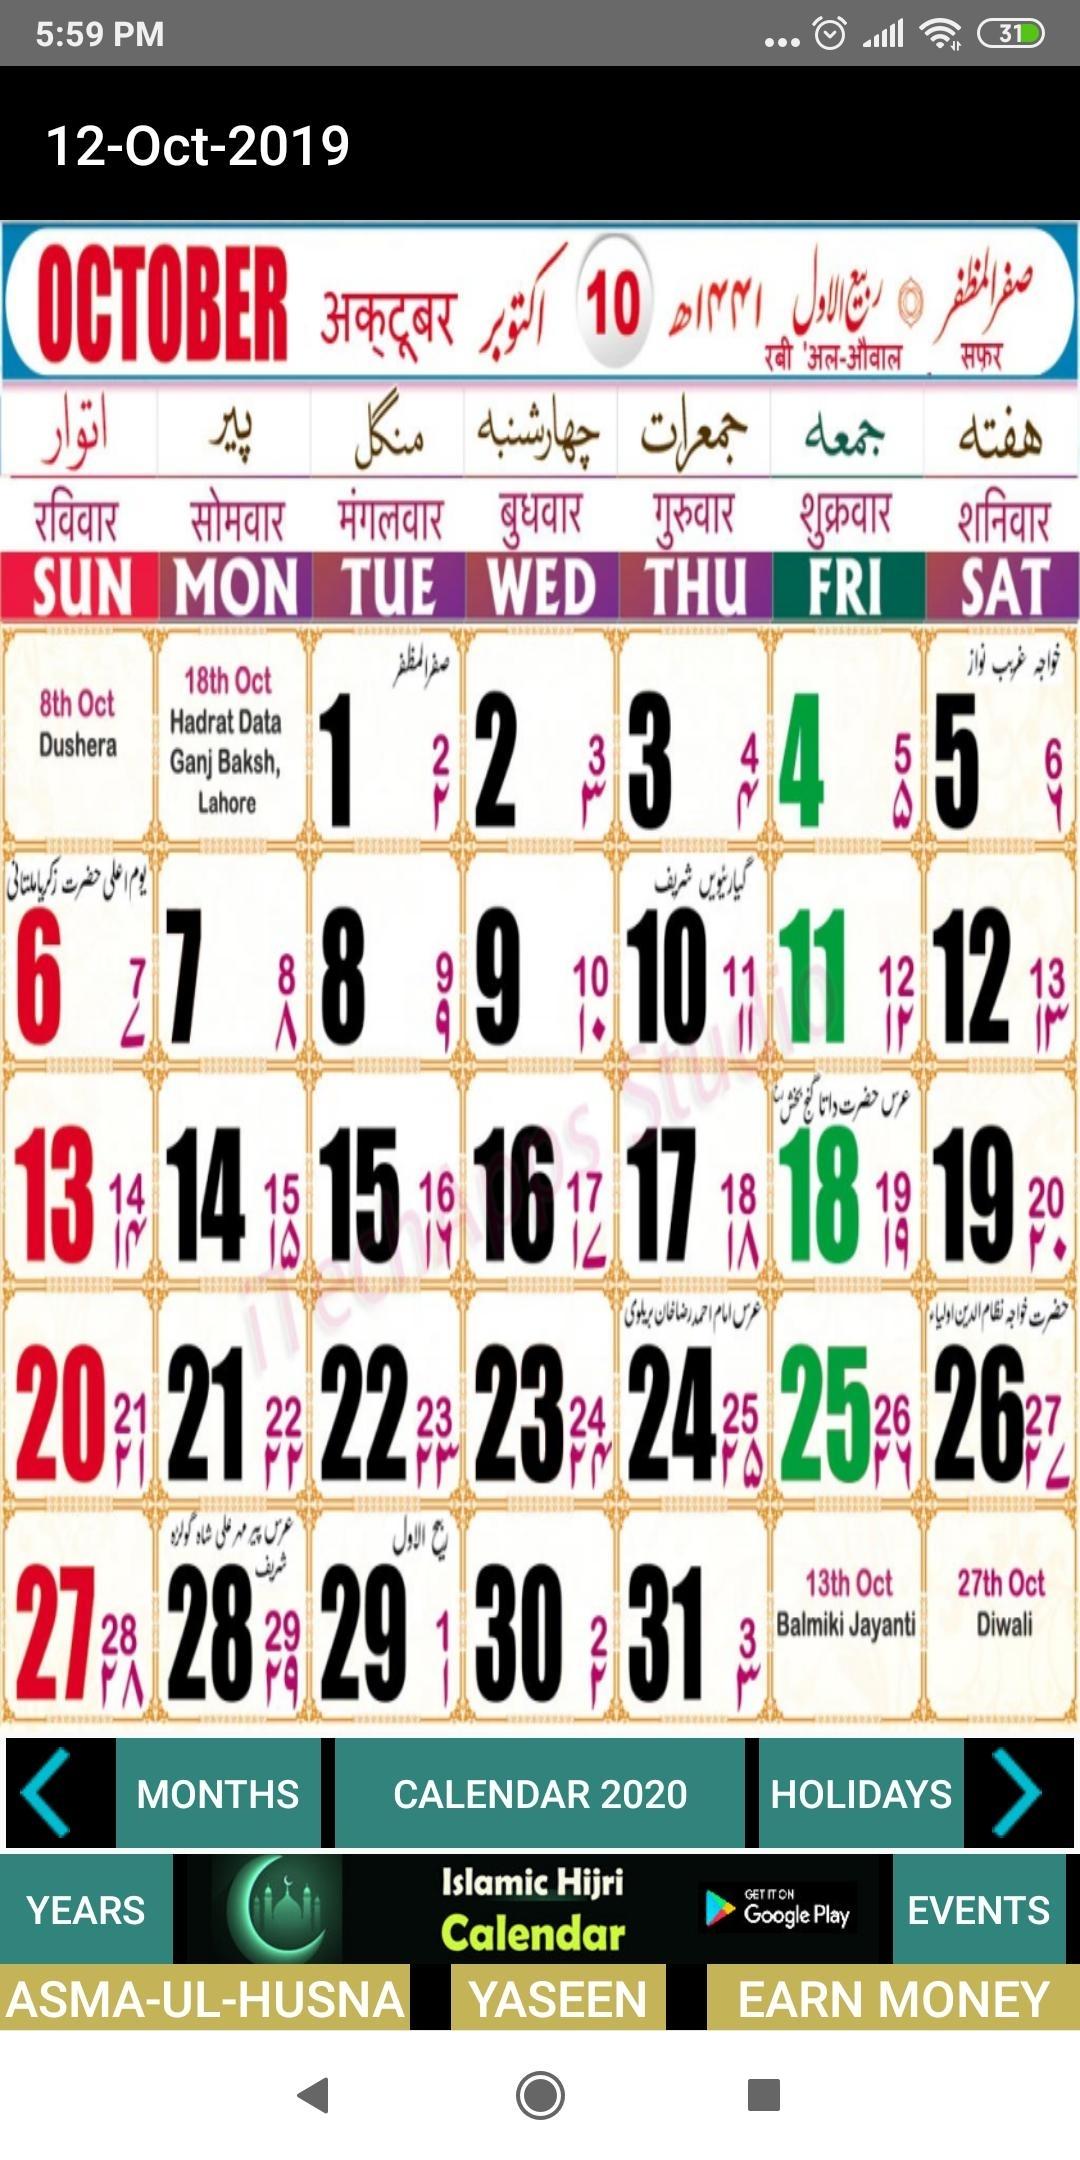 Urdu Calendar 2019 - Islamic Hijri Calendar 2020 For Android